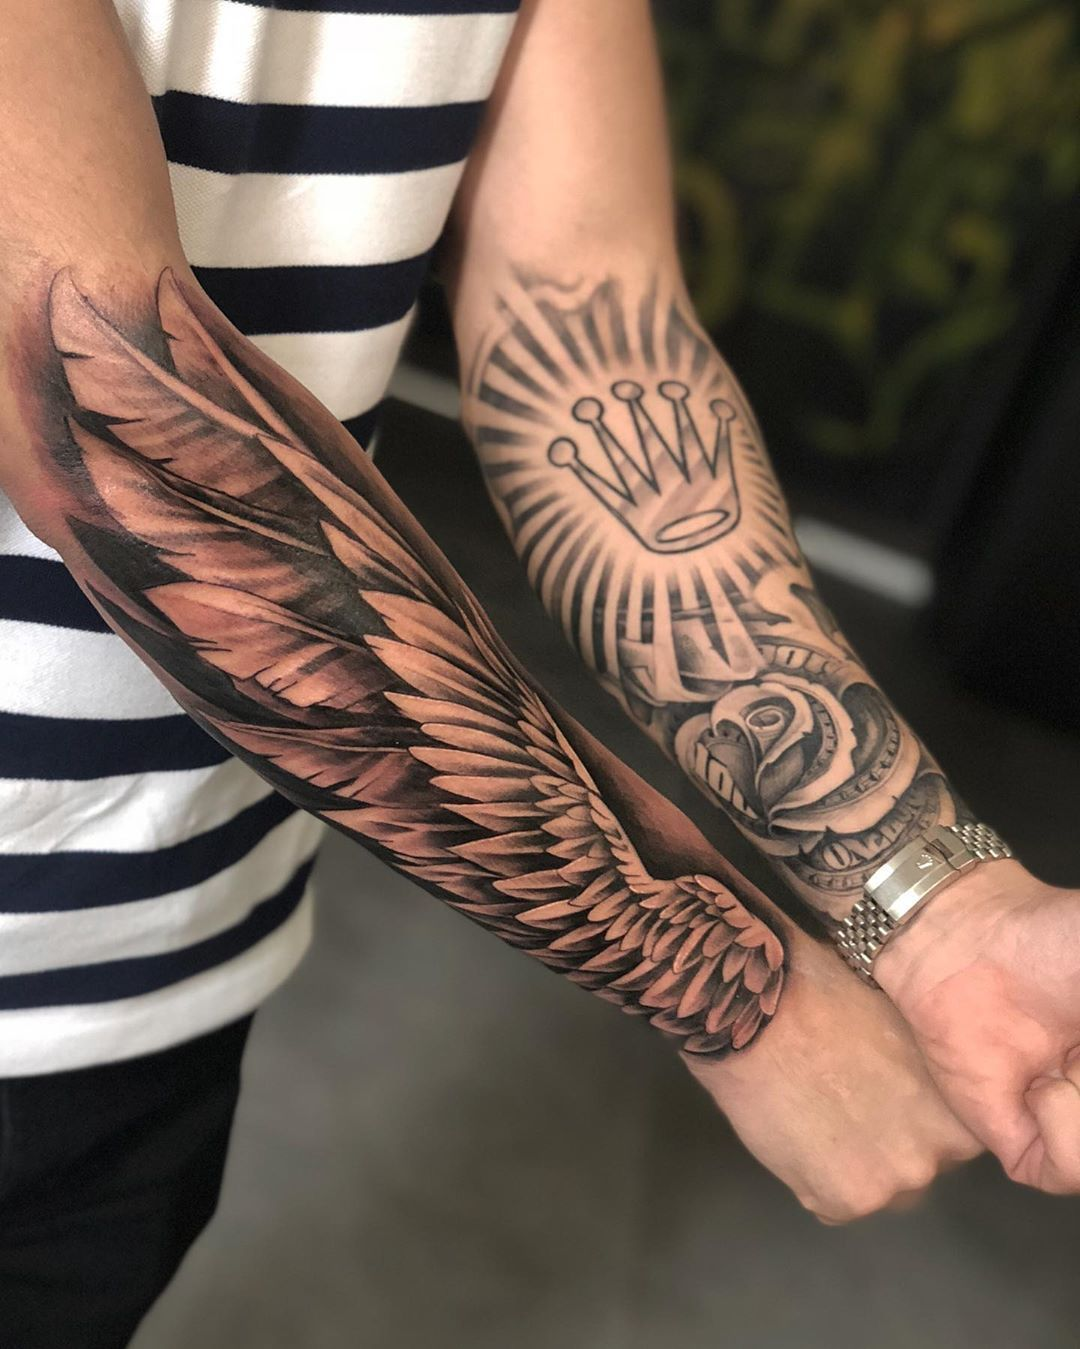 Flugel Tattoo Tattoo Engelsflugel Arm Design 11